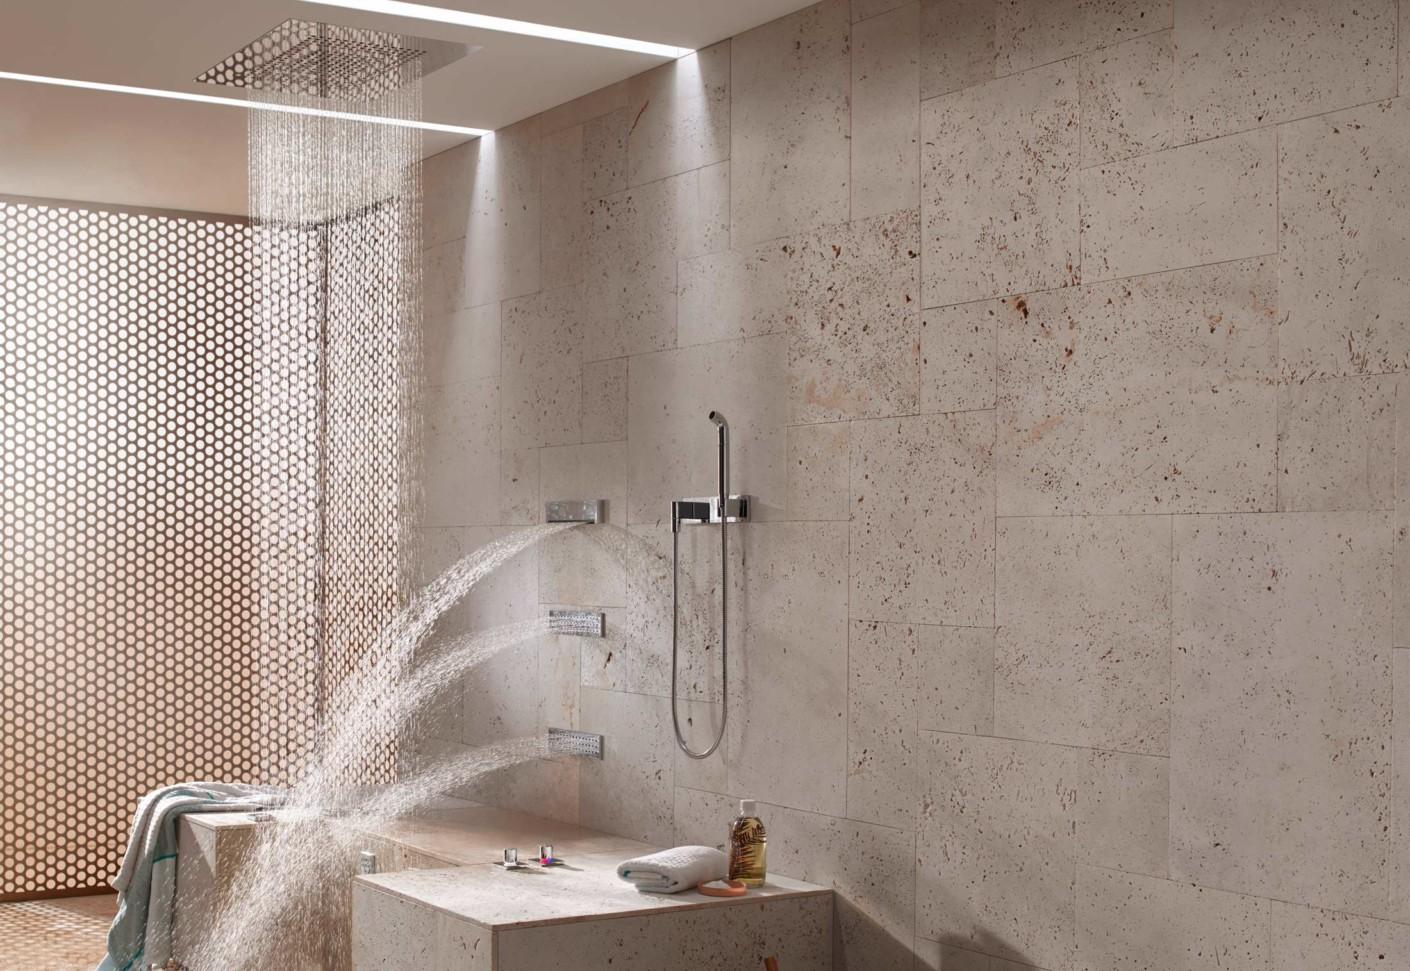 comfort shower leg shower by dornbracht stylepark. Black Bedroom Furniture Sets. Home Design Ideas